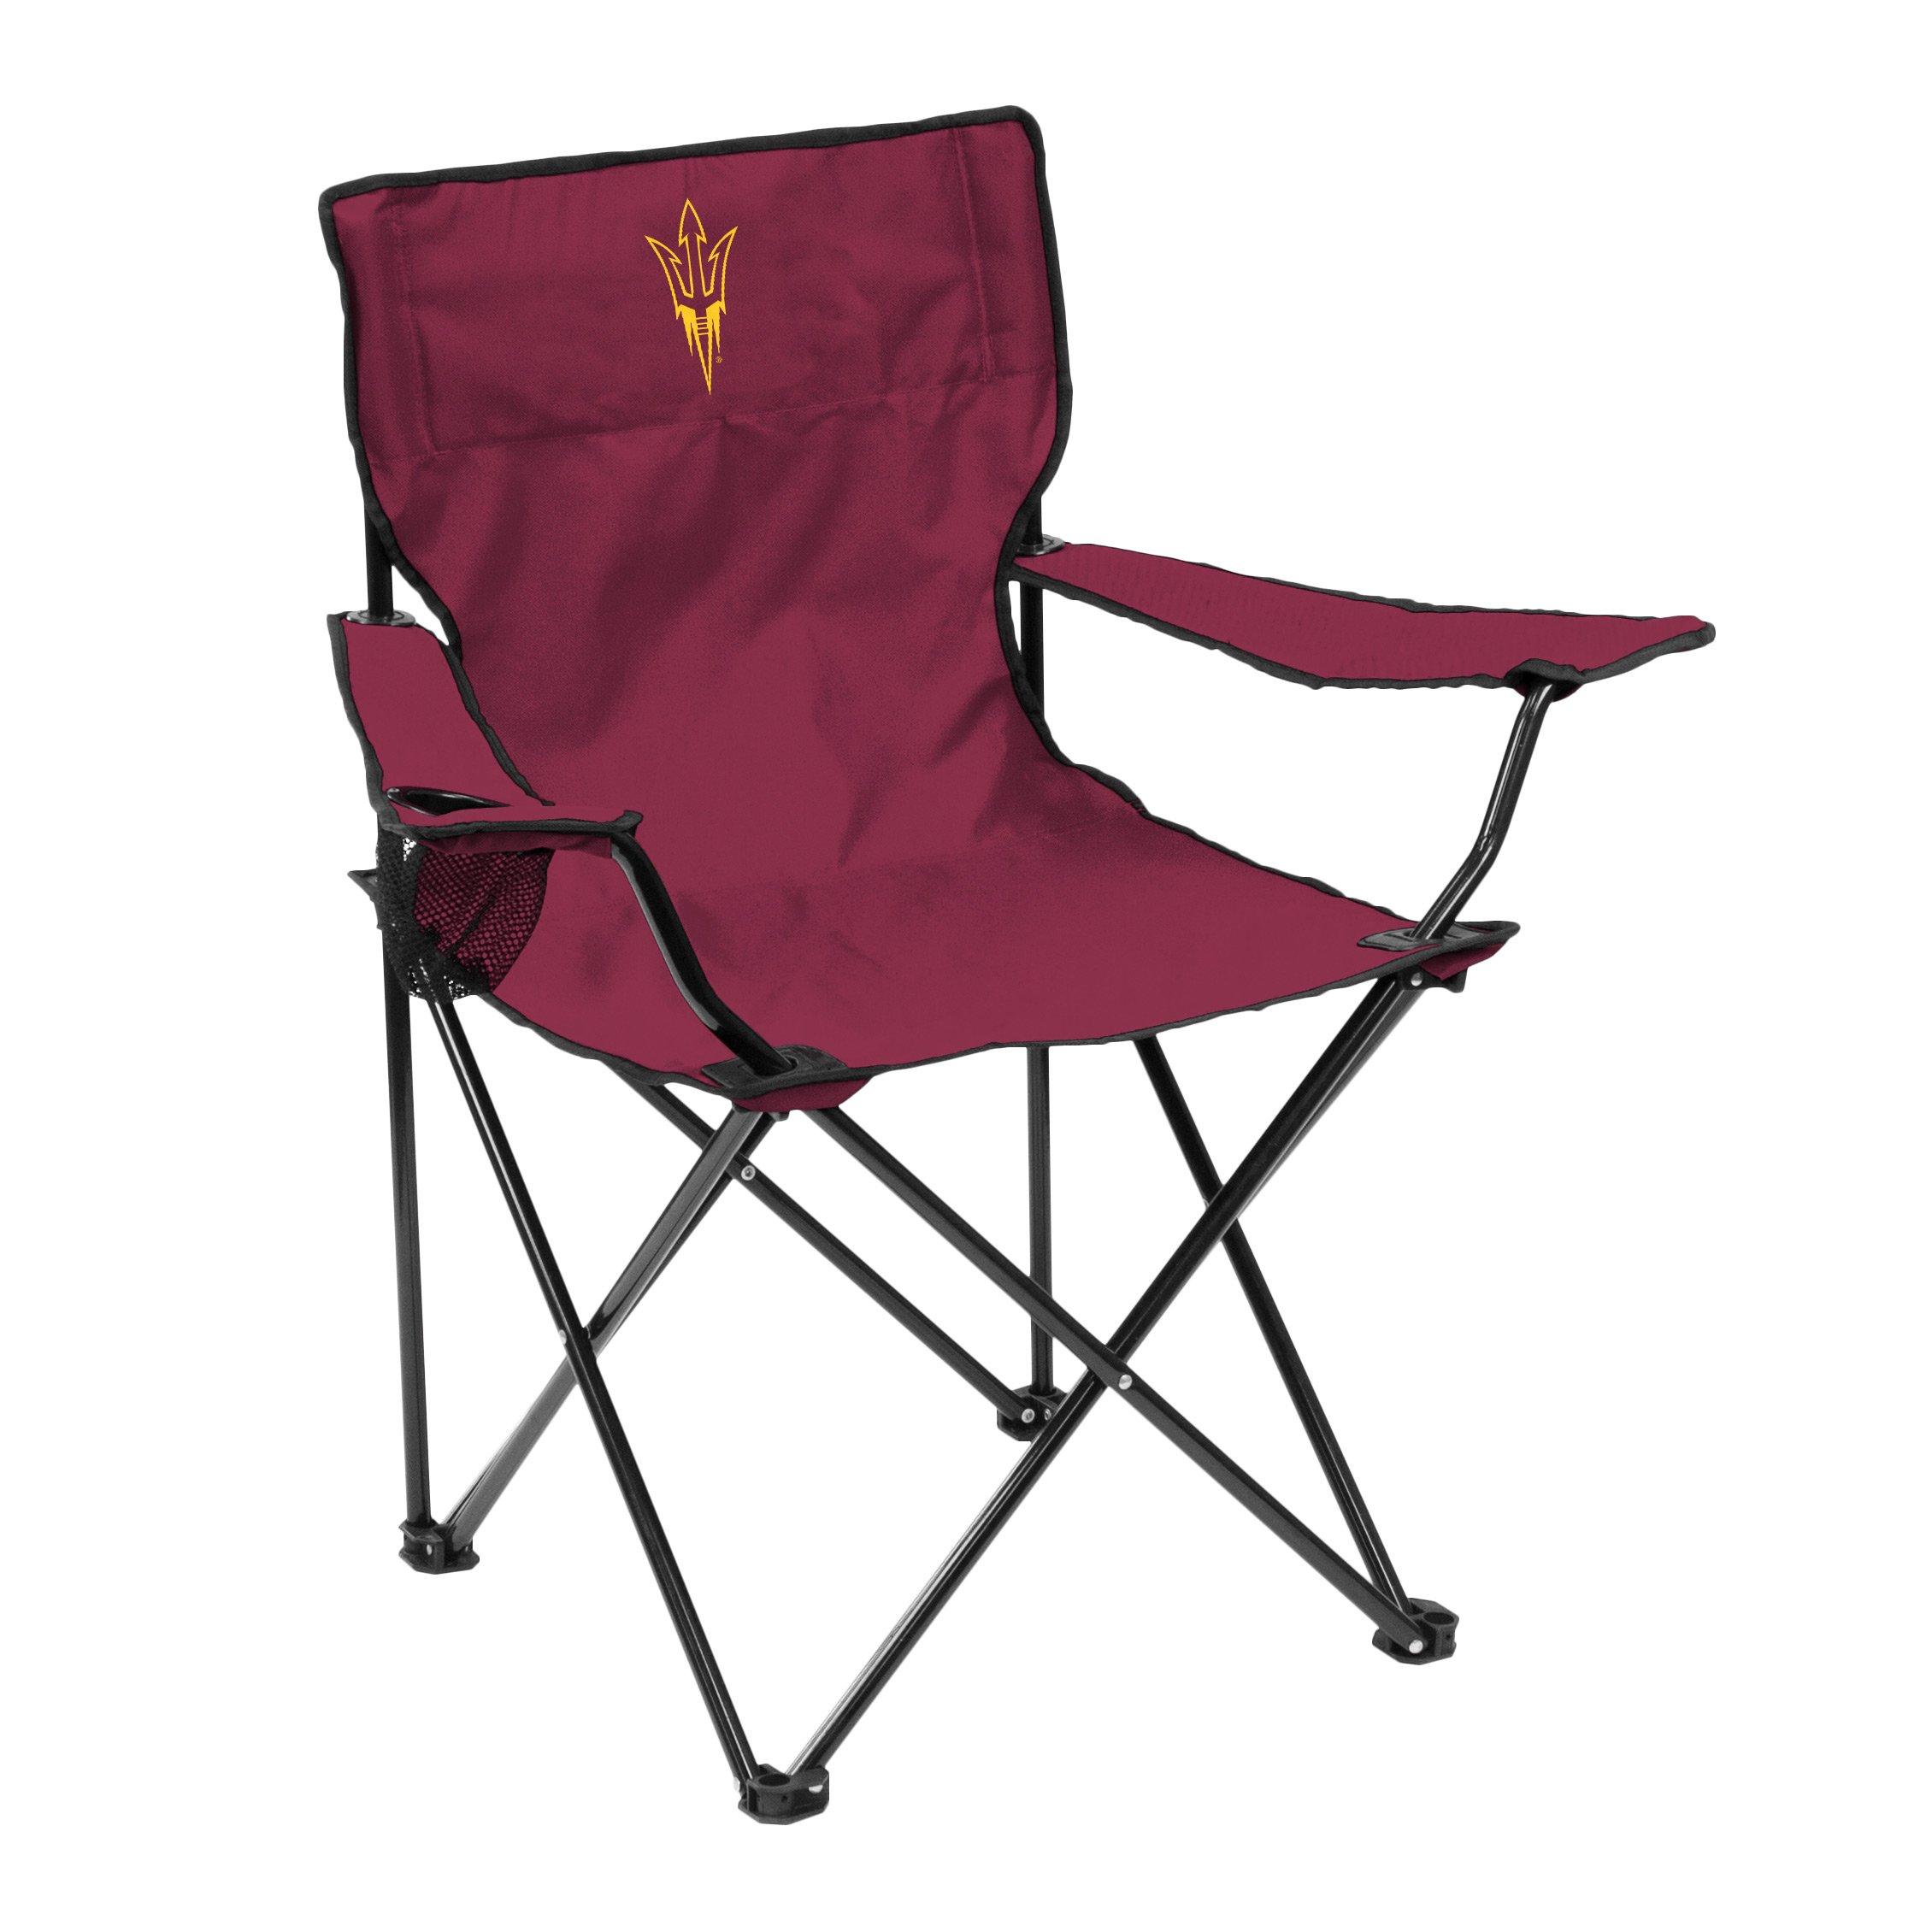 NCAA Arizona State Sun Devils Quad Chair, Adult, Red